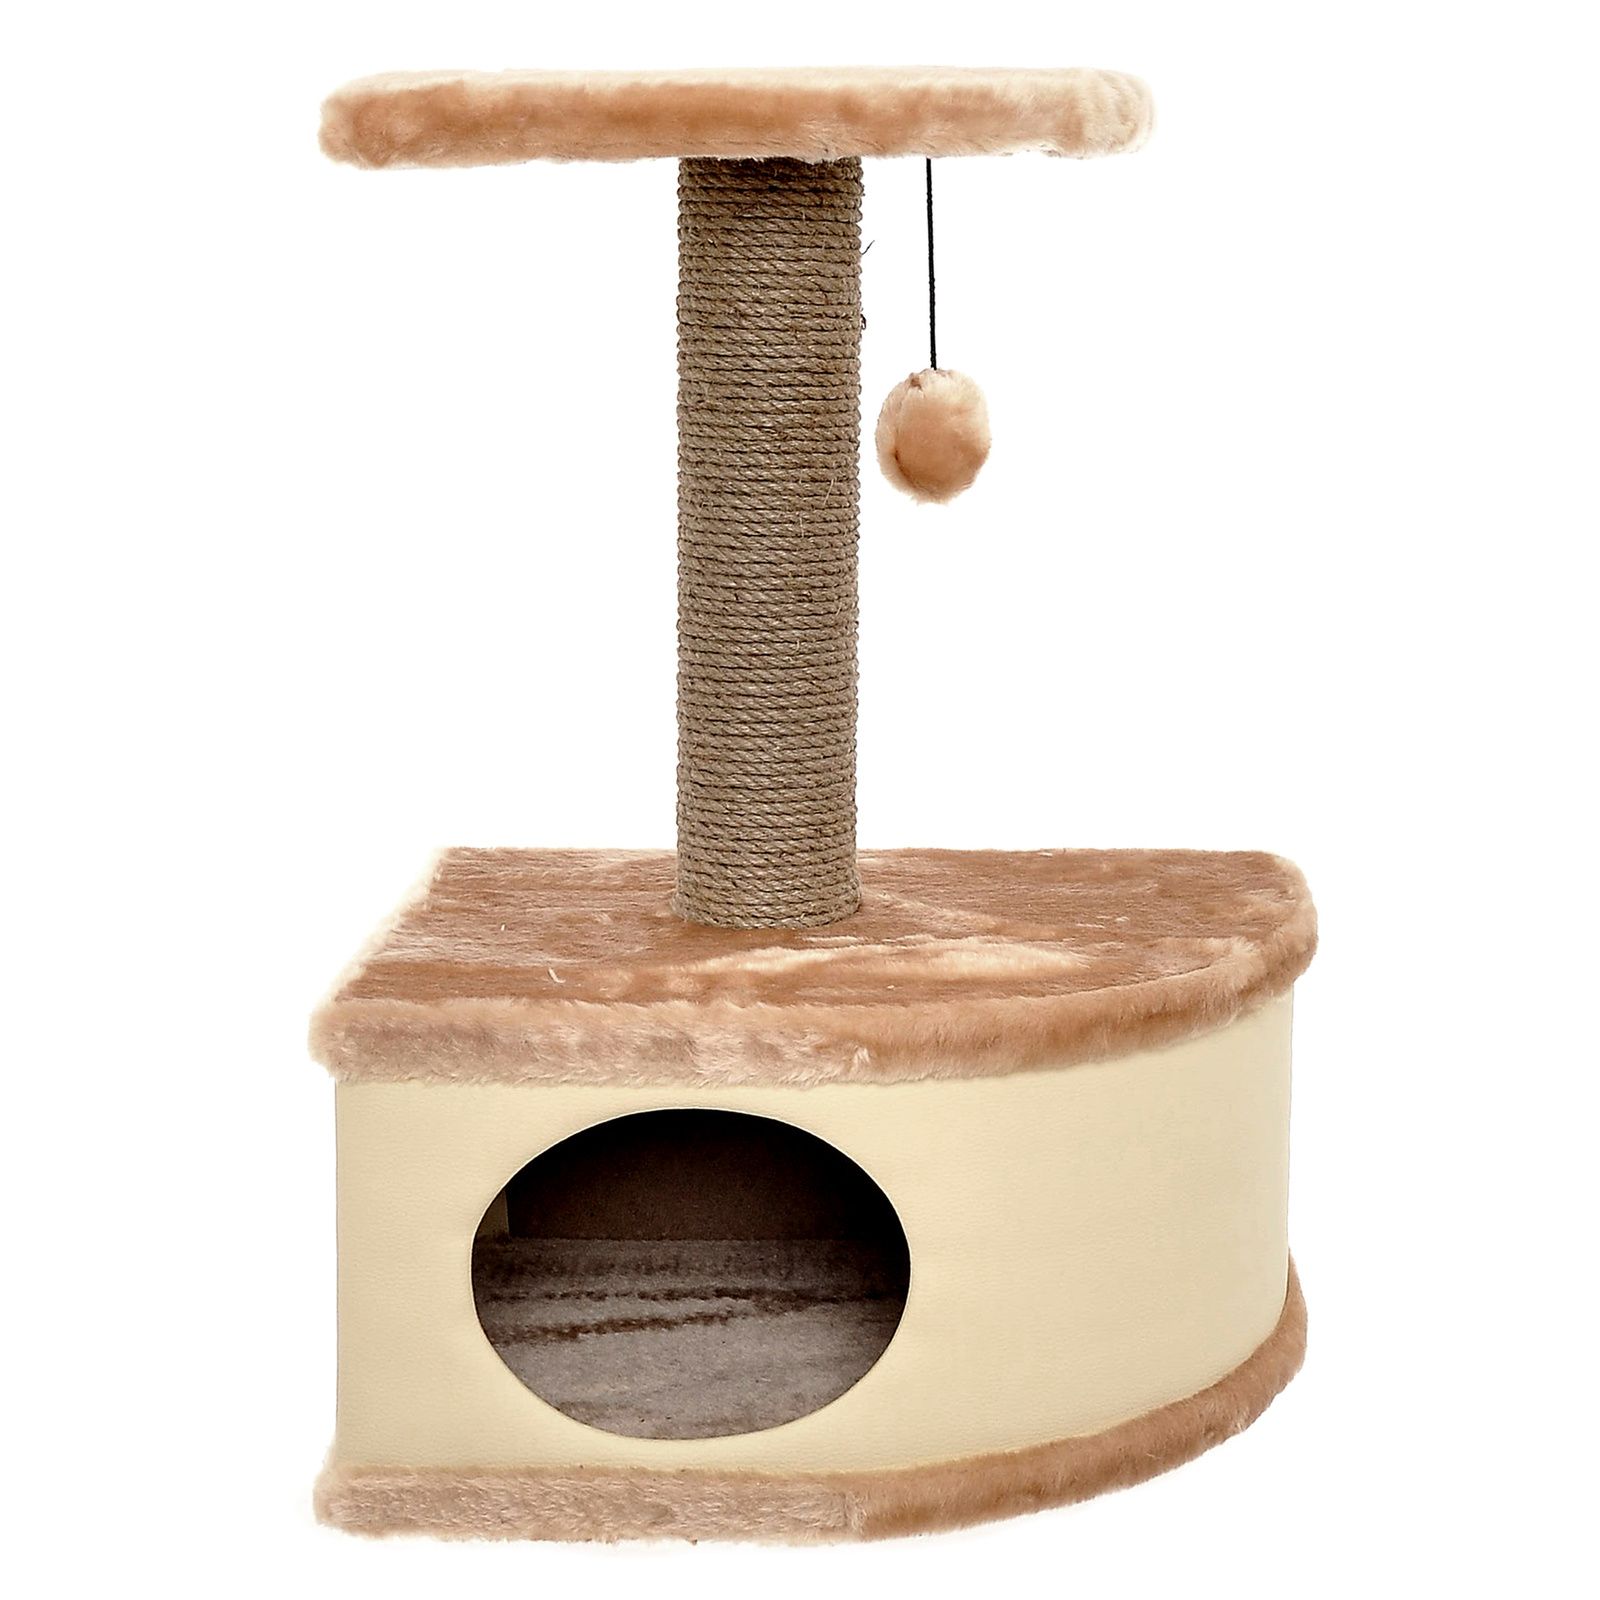 Yami-Yami Домик-когтеточка угловой Конфетти бежевый, 49х37х70 см (7,27 кг)